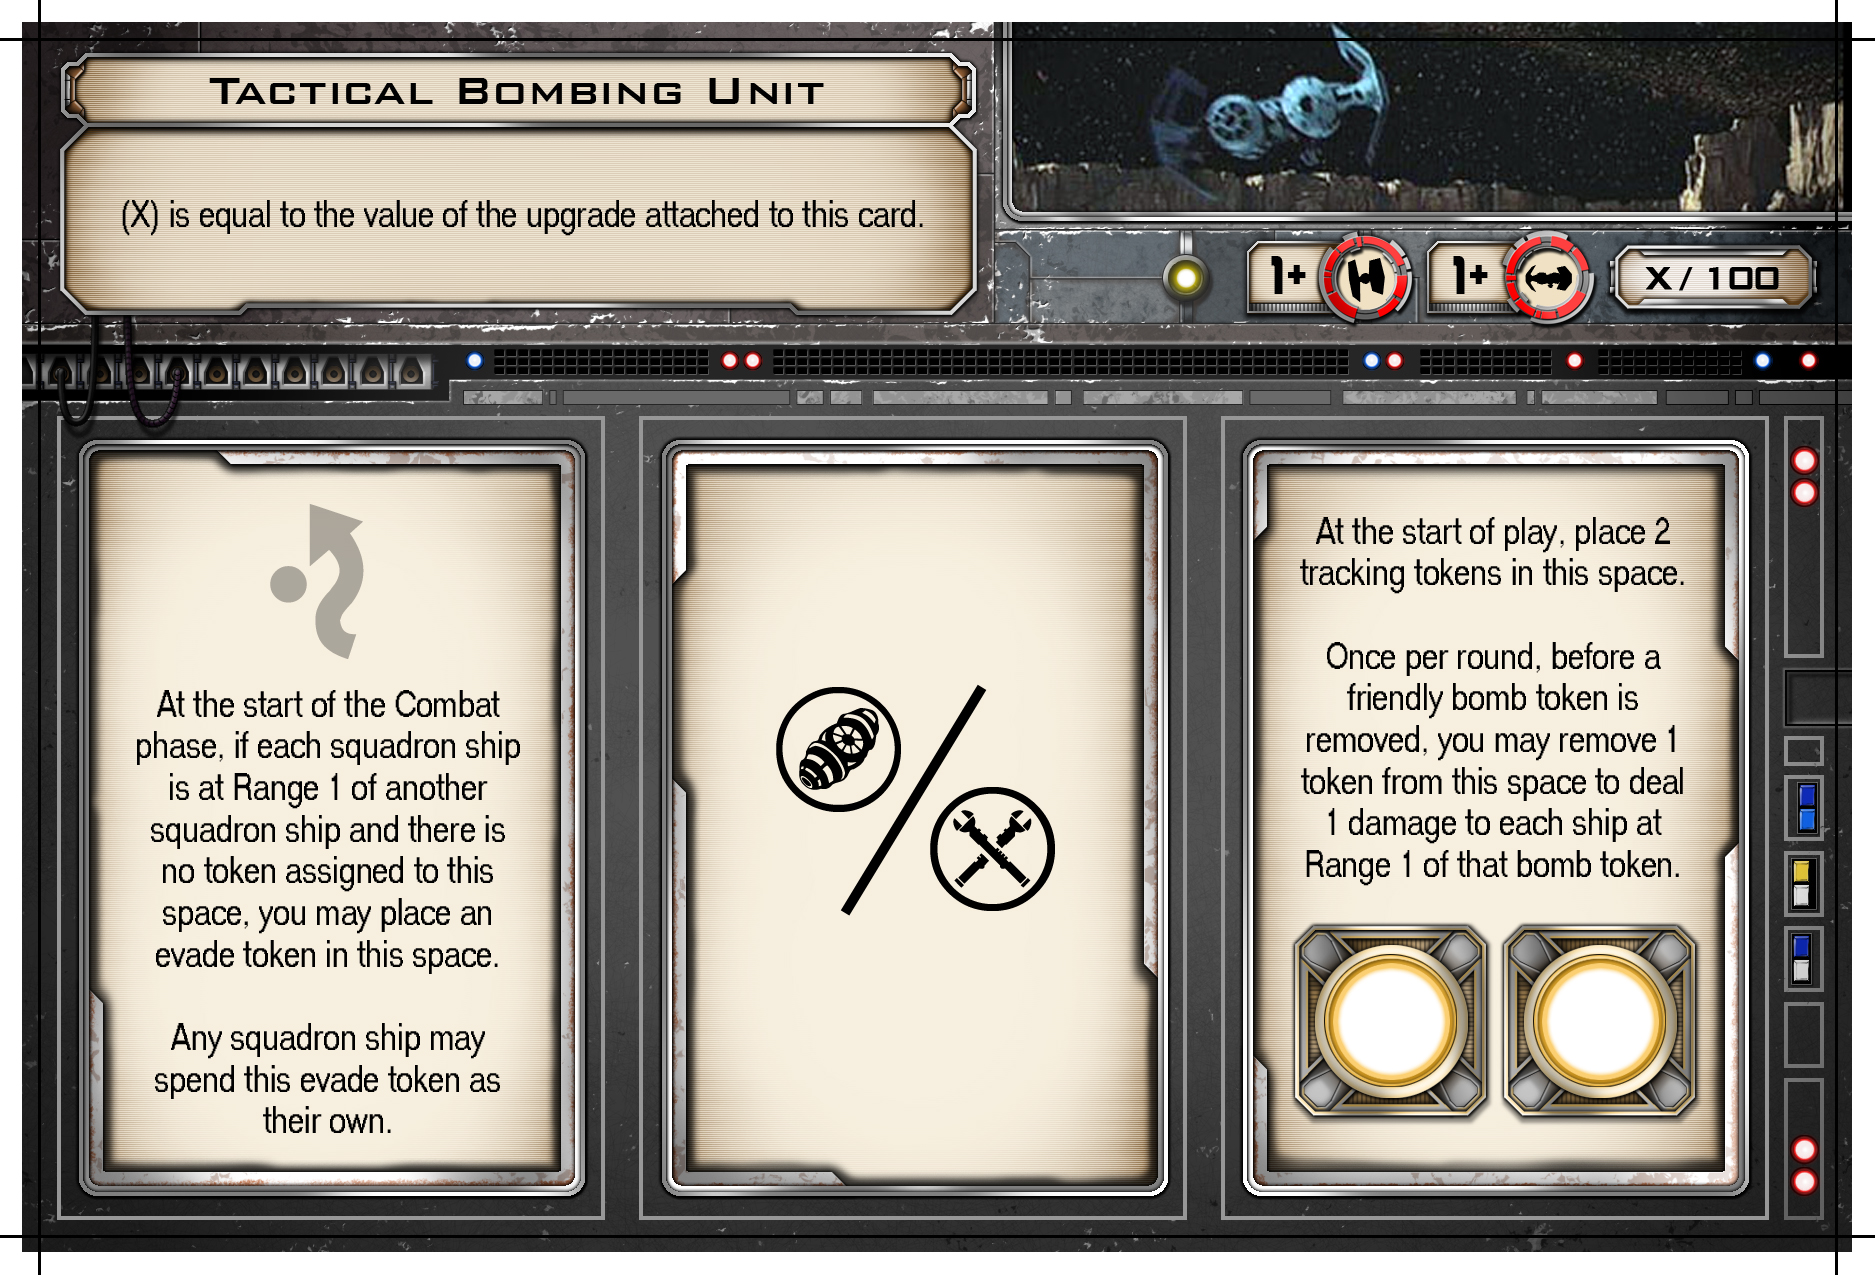 tactical-bombing-unit.jpg